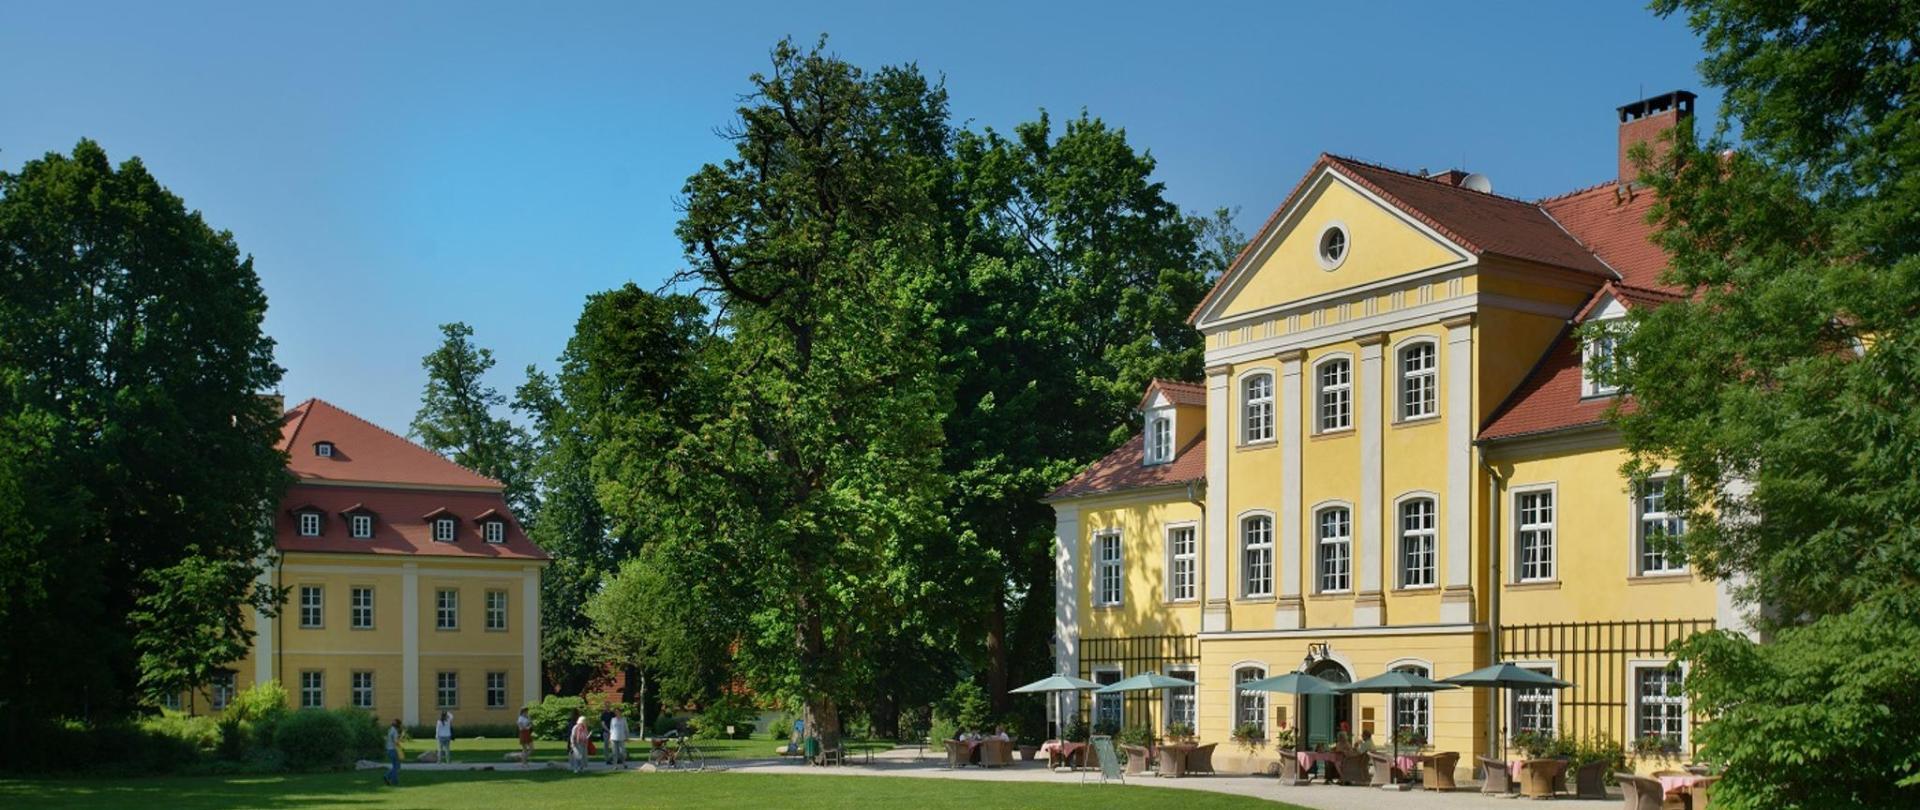 Pałac Łomnica - Karkonosze / Riesengebirge